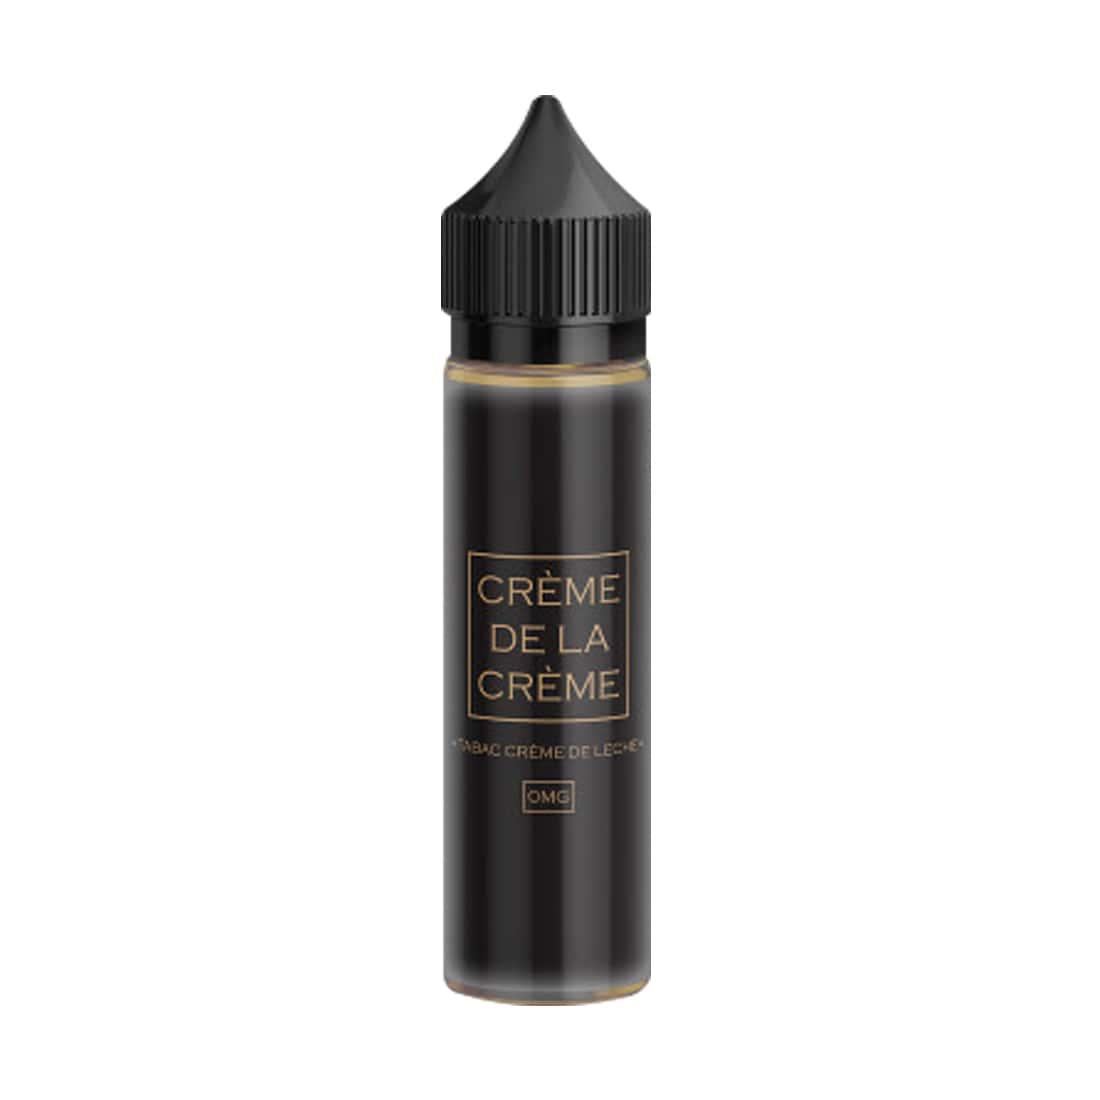 Photo de E liquide Crème de la Crème Tabac Crème de Leche 0 mg 50 ml